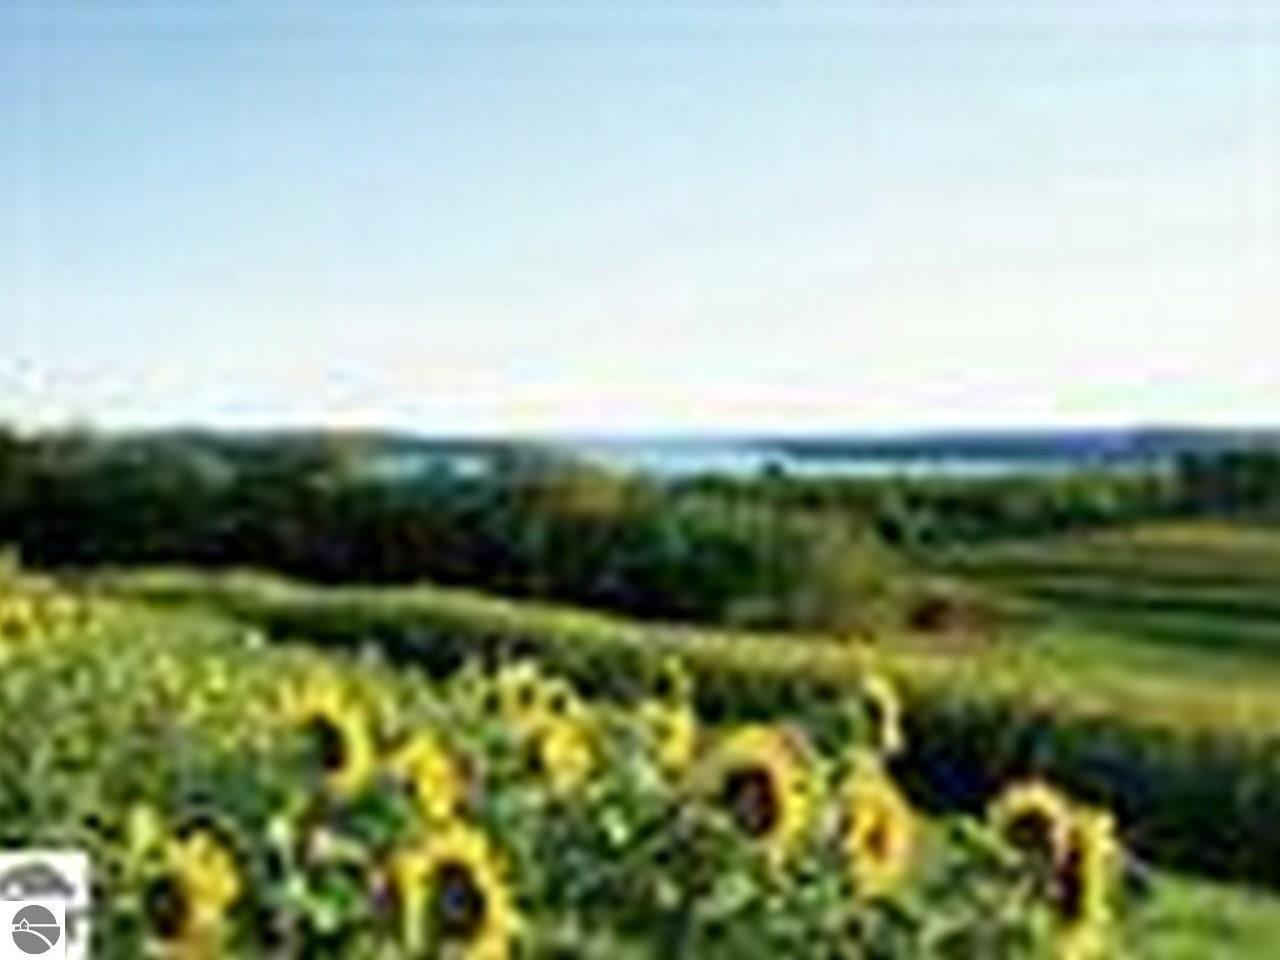 4811 E Water View Dr, Lake Leelanau, MI 49653, Lake Leelanau, Michigan 49653